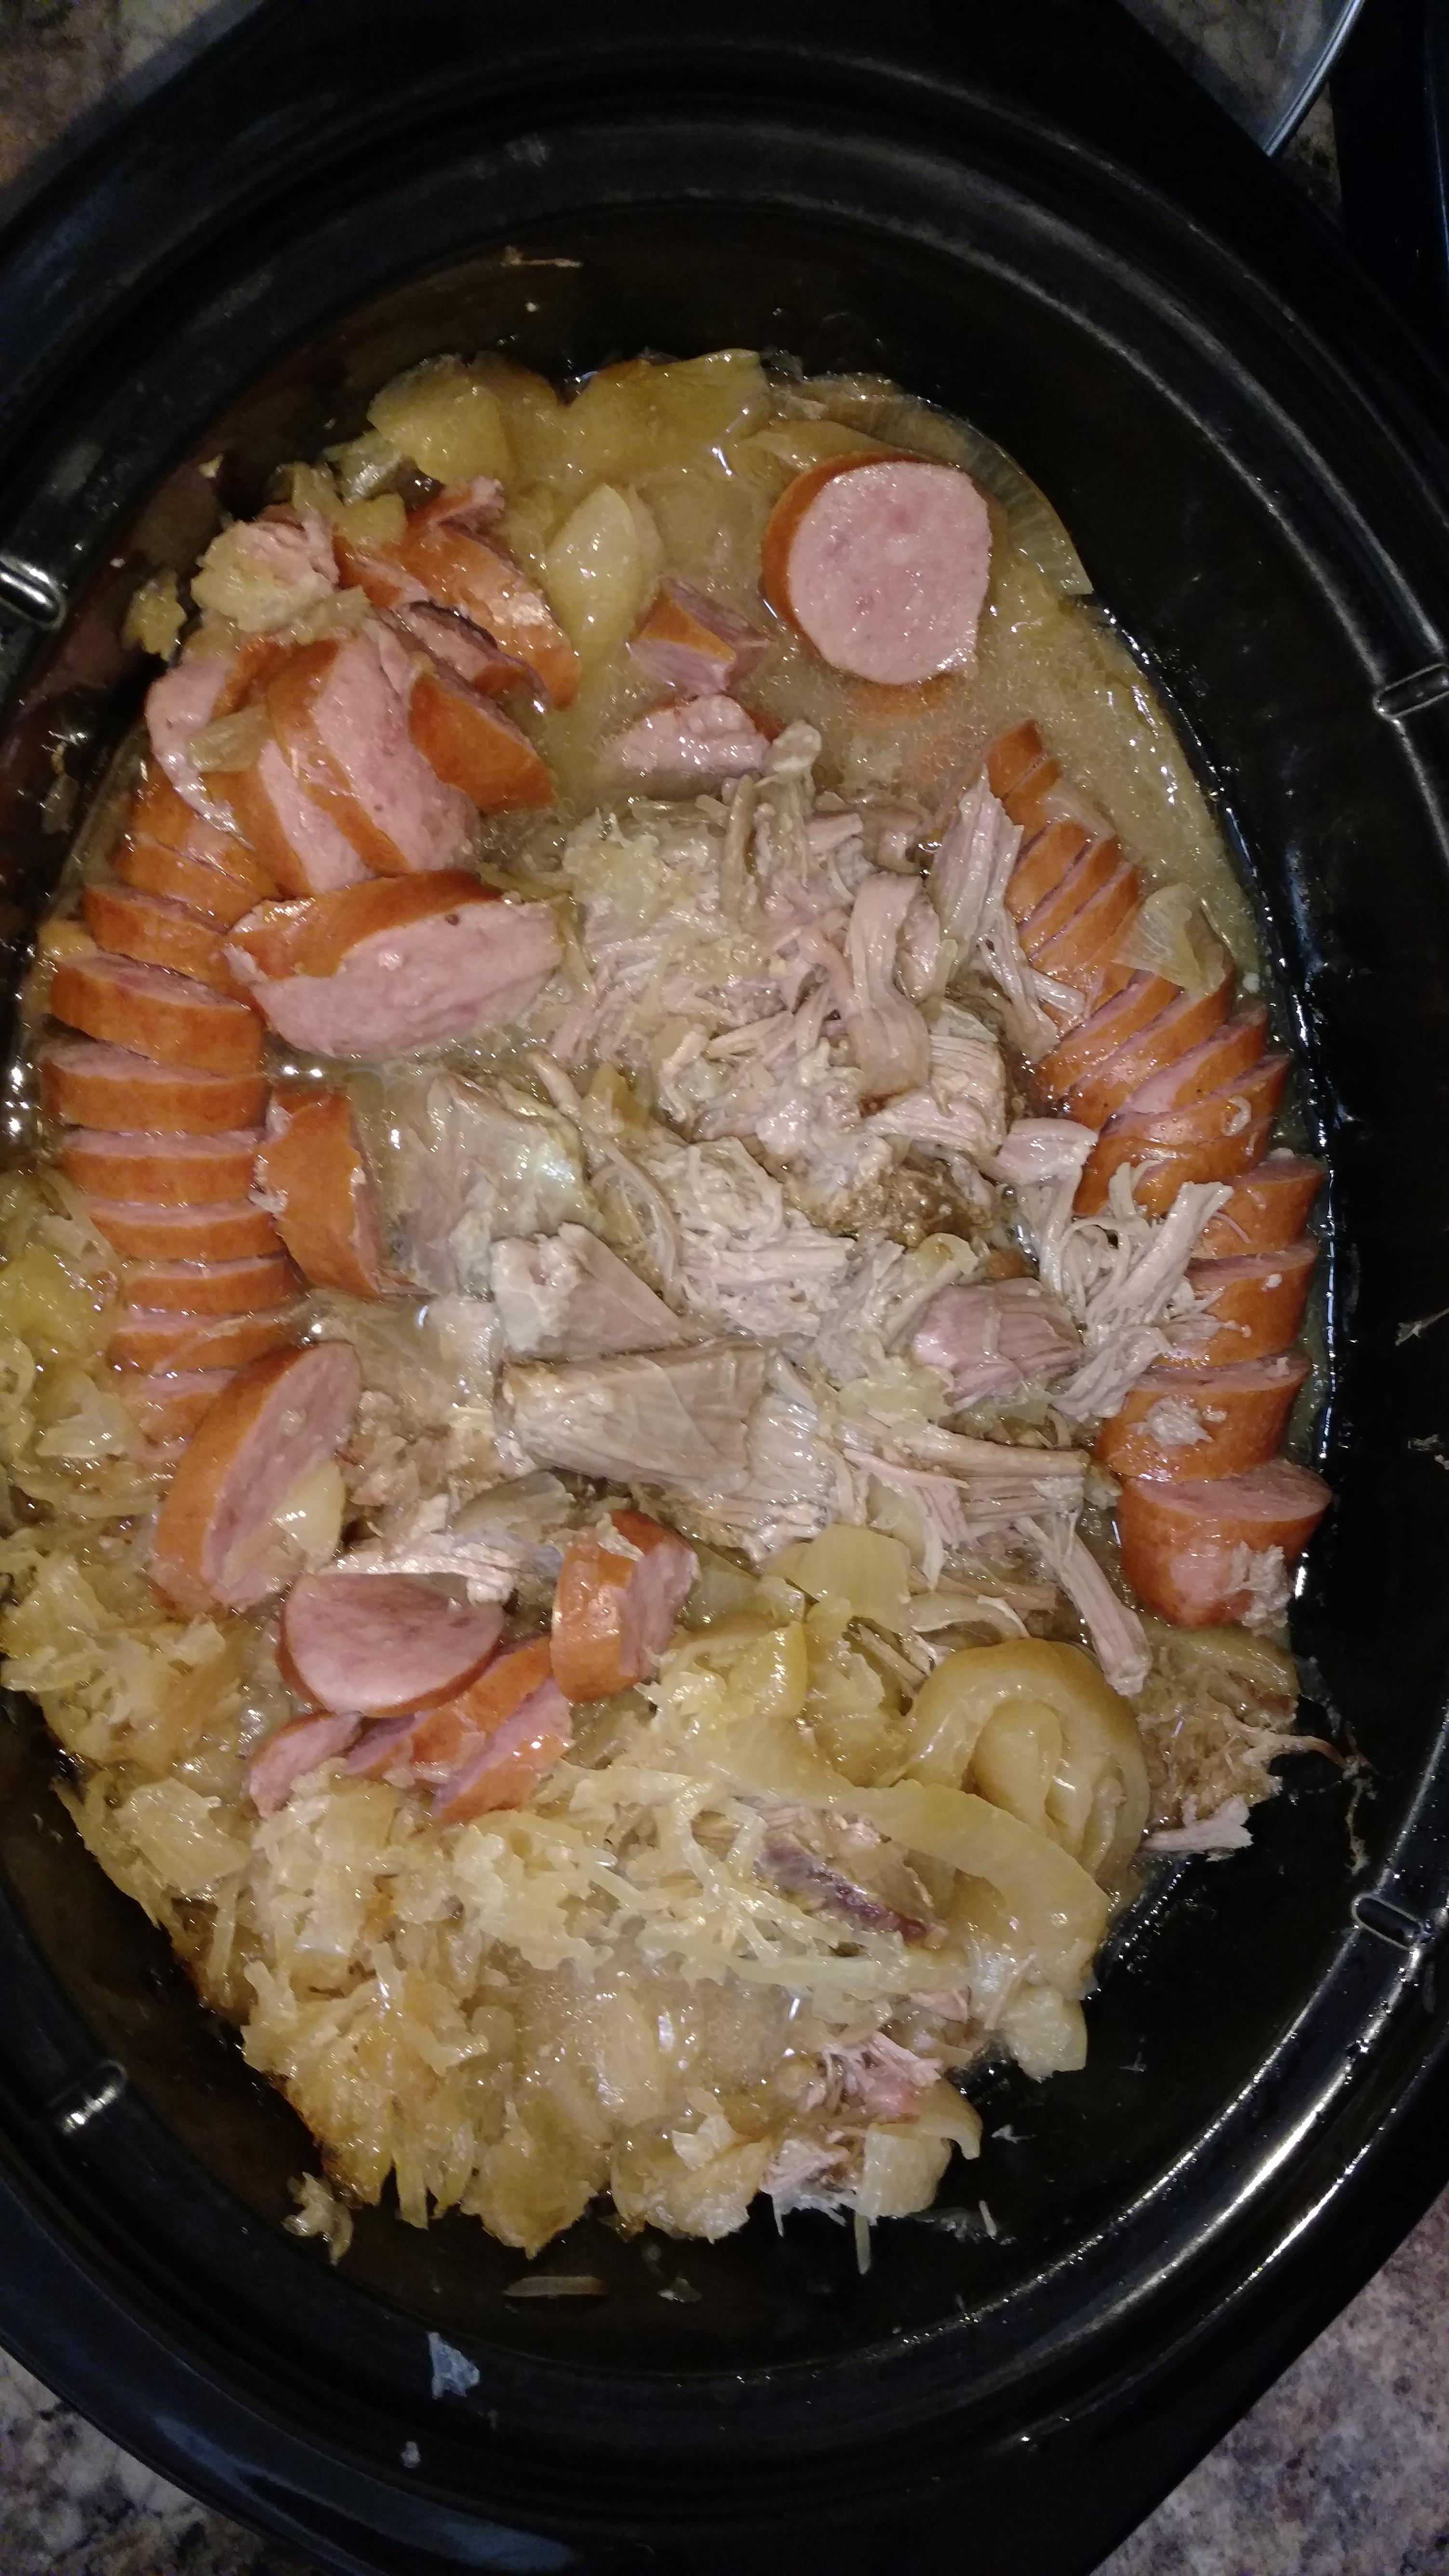 Pork Roast with Apples, Beer, and Sauerkraut